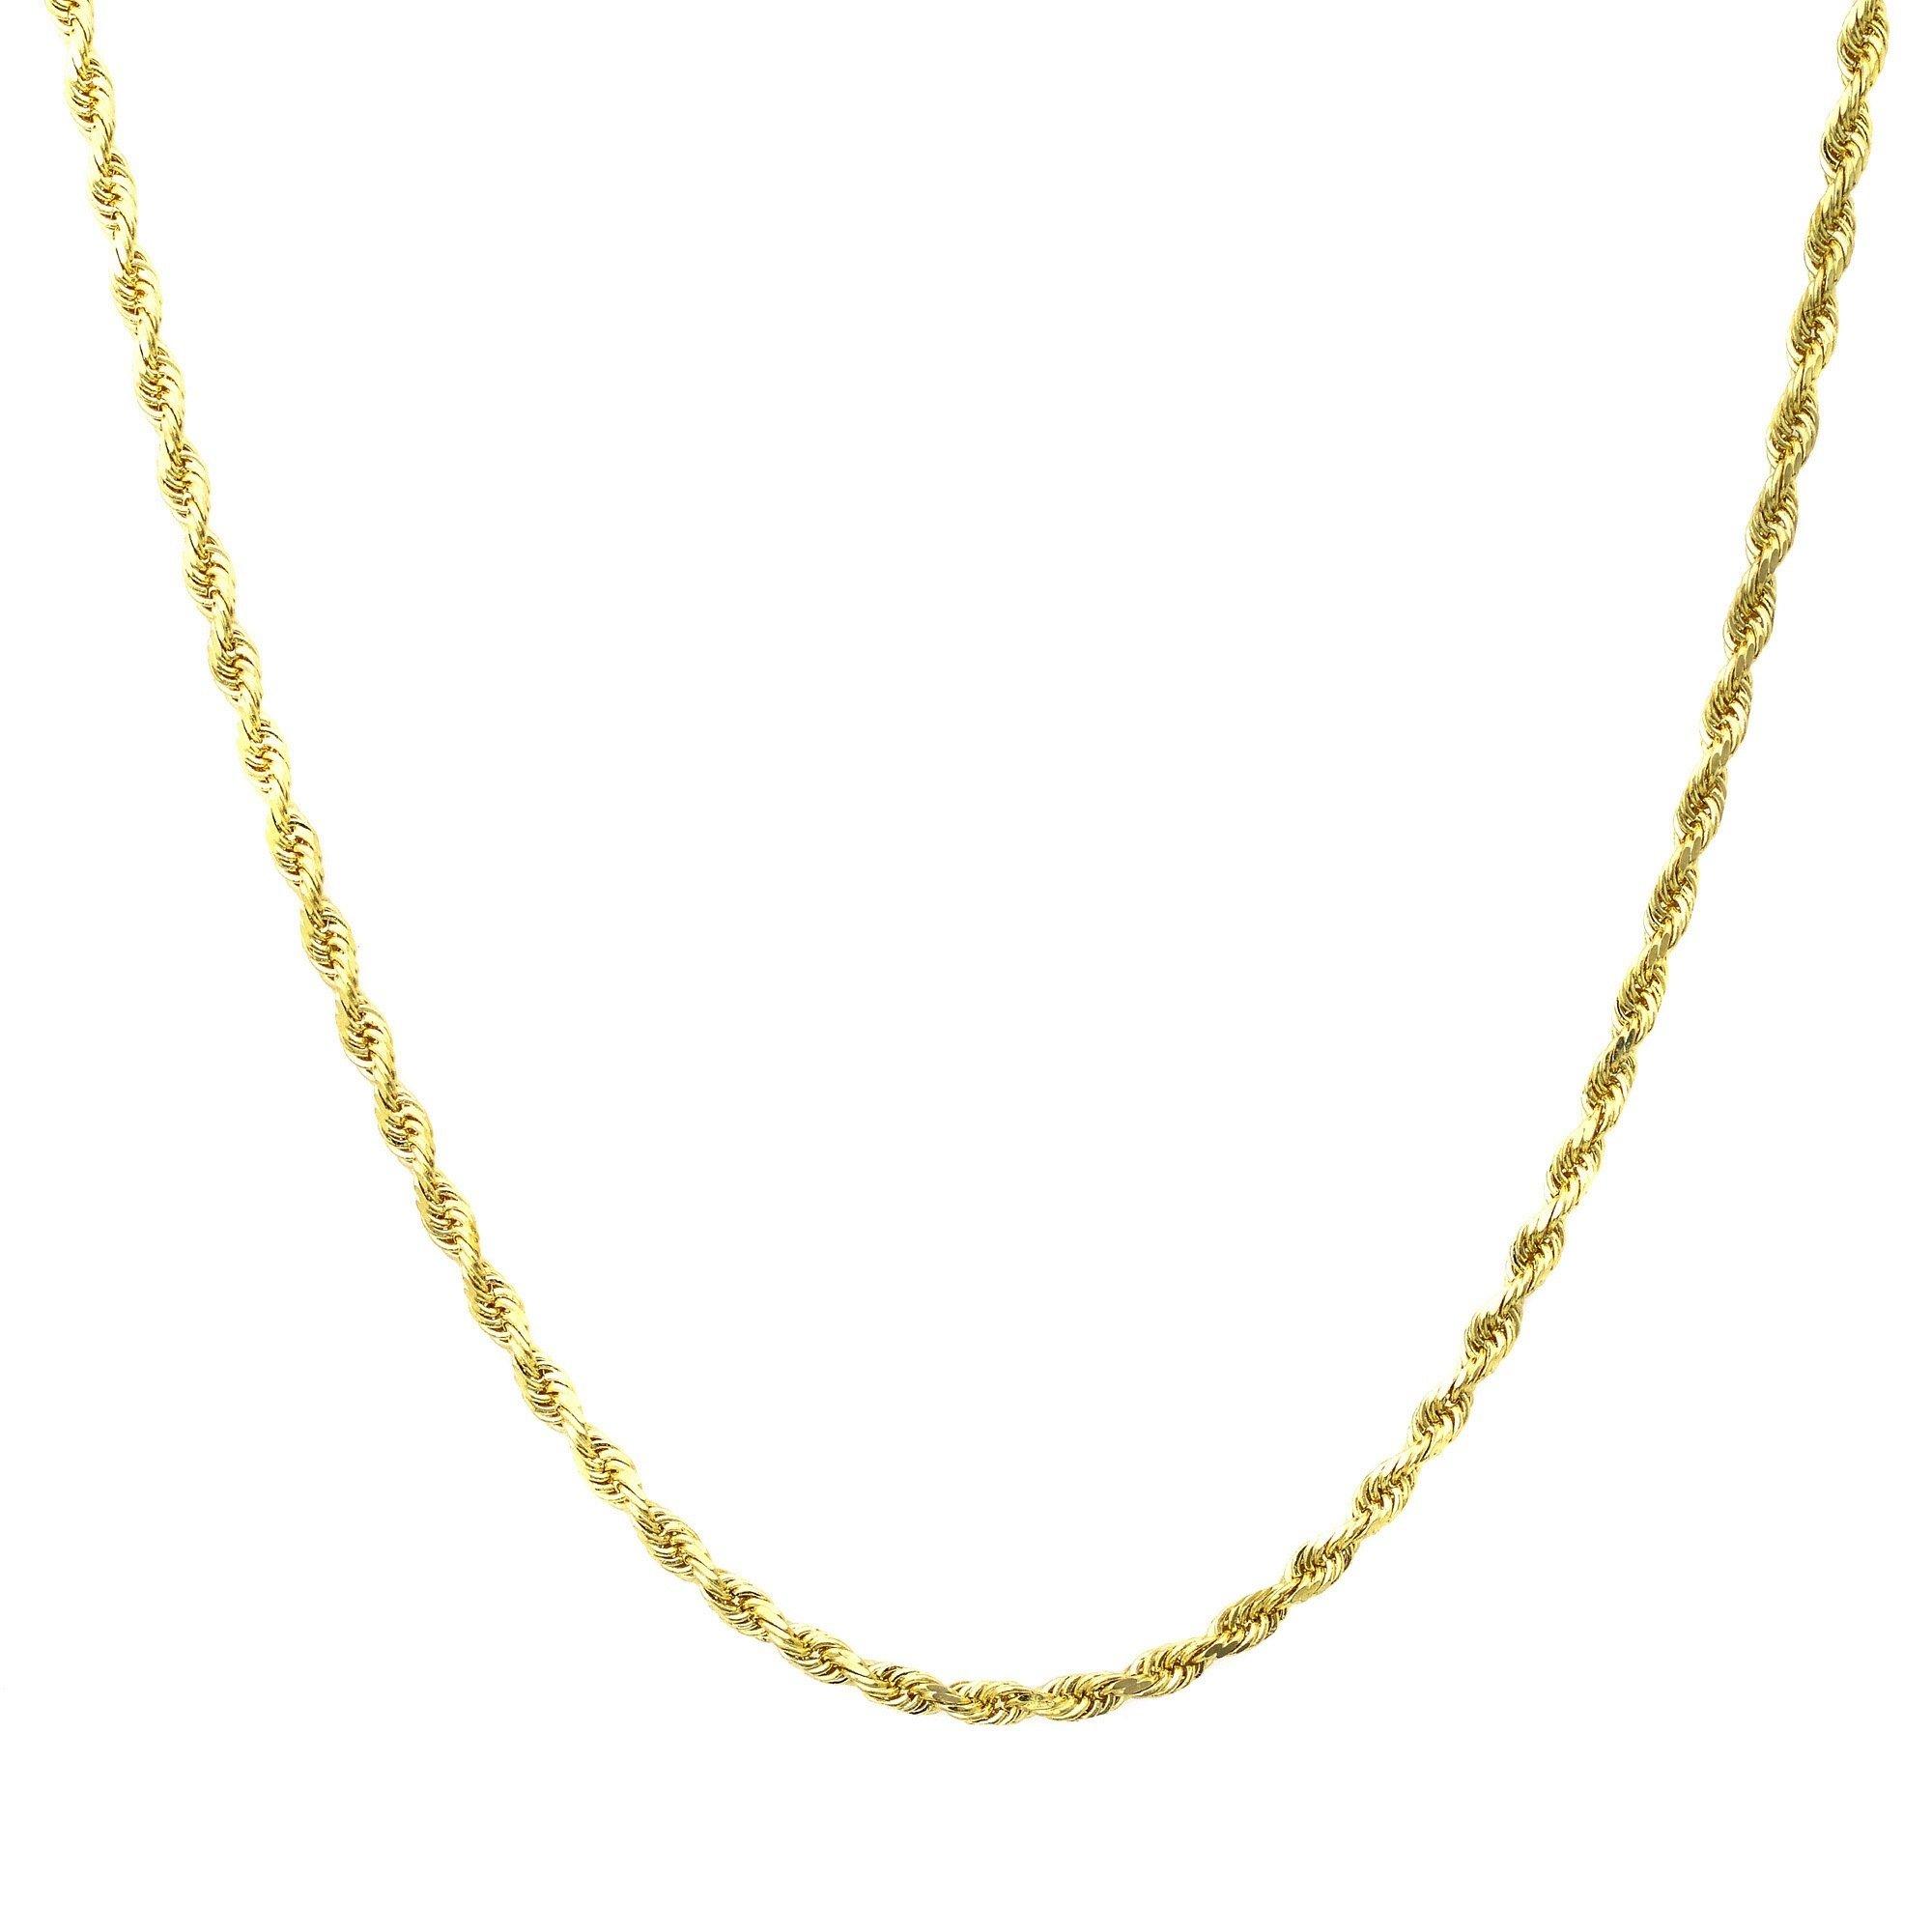 18K Gold 2MM Diamond Cut Rope Chain Necklace Unisex Sizes 16''-30'' - 18 Karat Gold… (30)